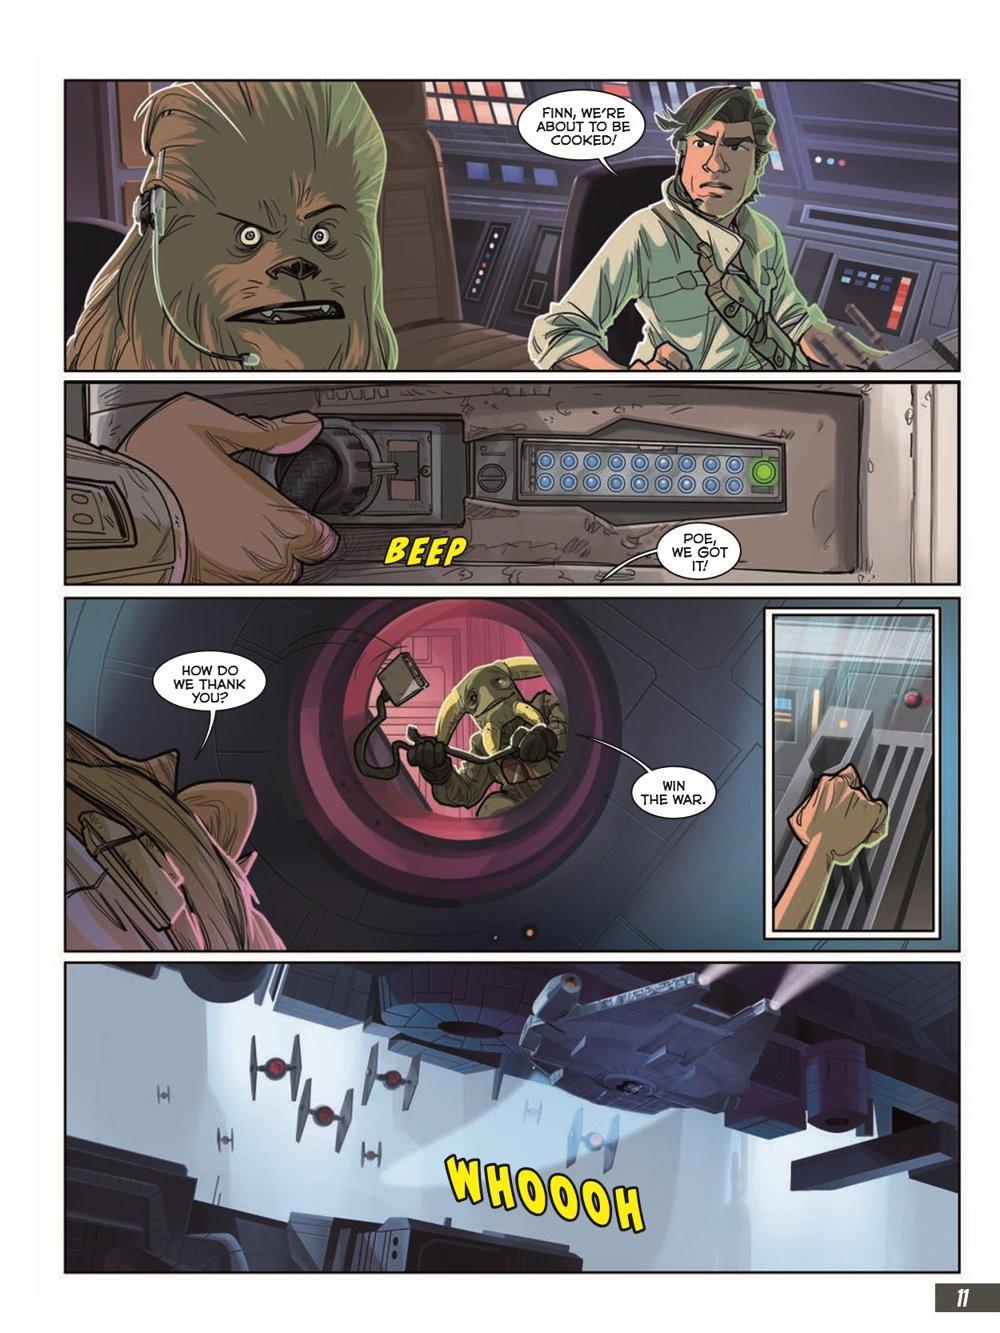 StarWars_IX_TheRiseOfSkywalker_pr-7 ComicList Previews: STAR WARS THE RISE OF SKYWALKER GN